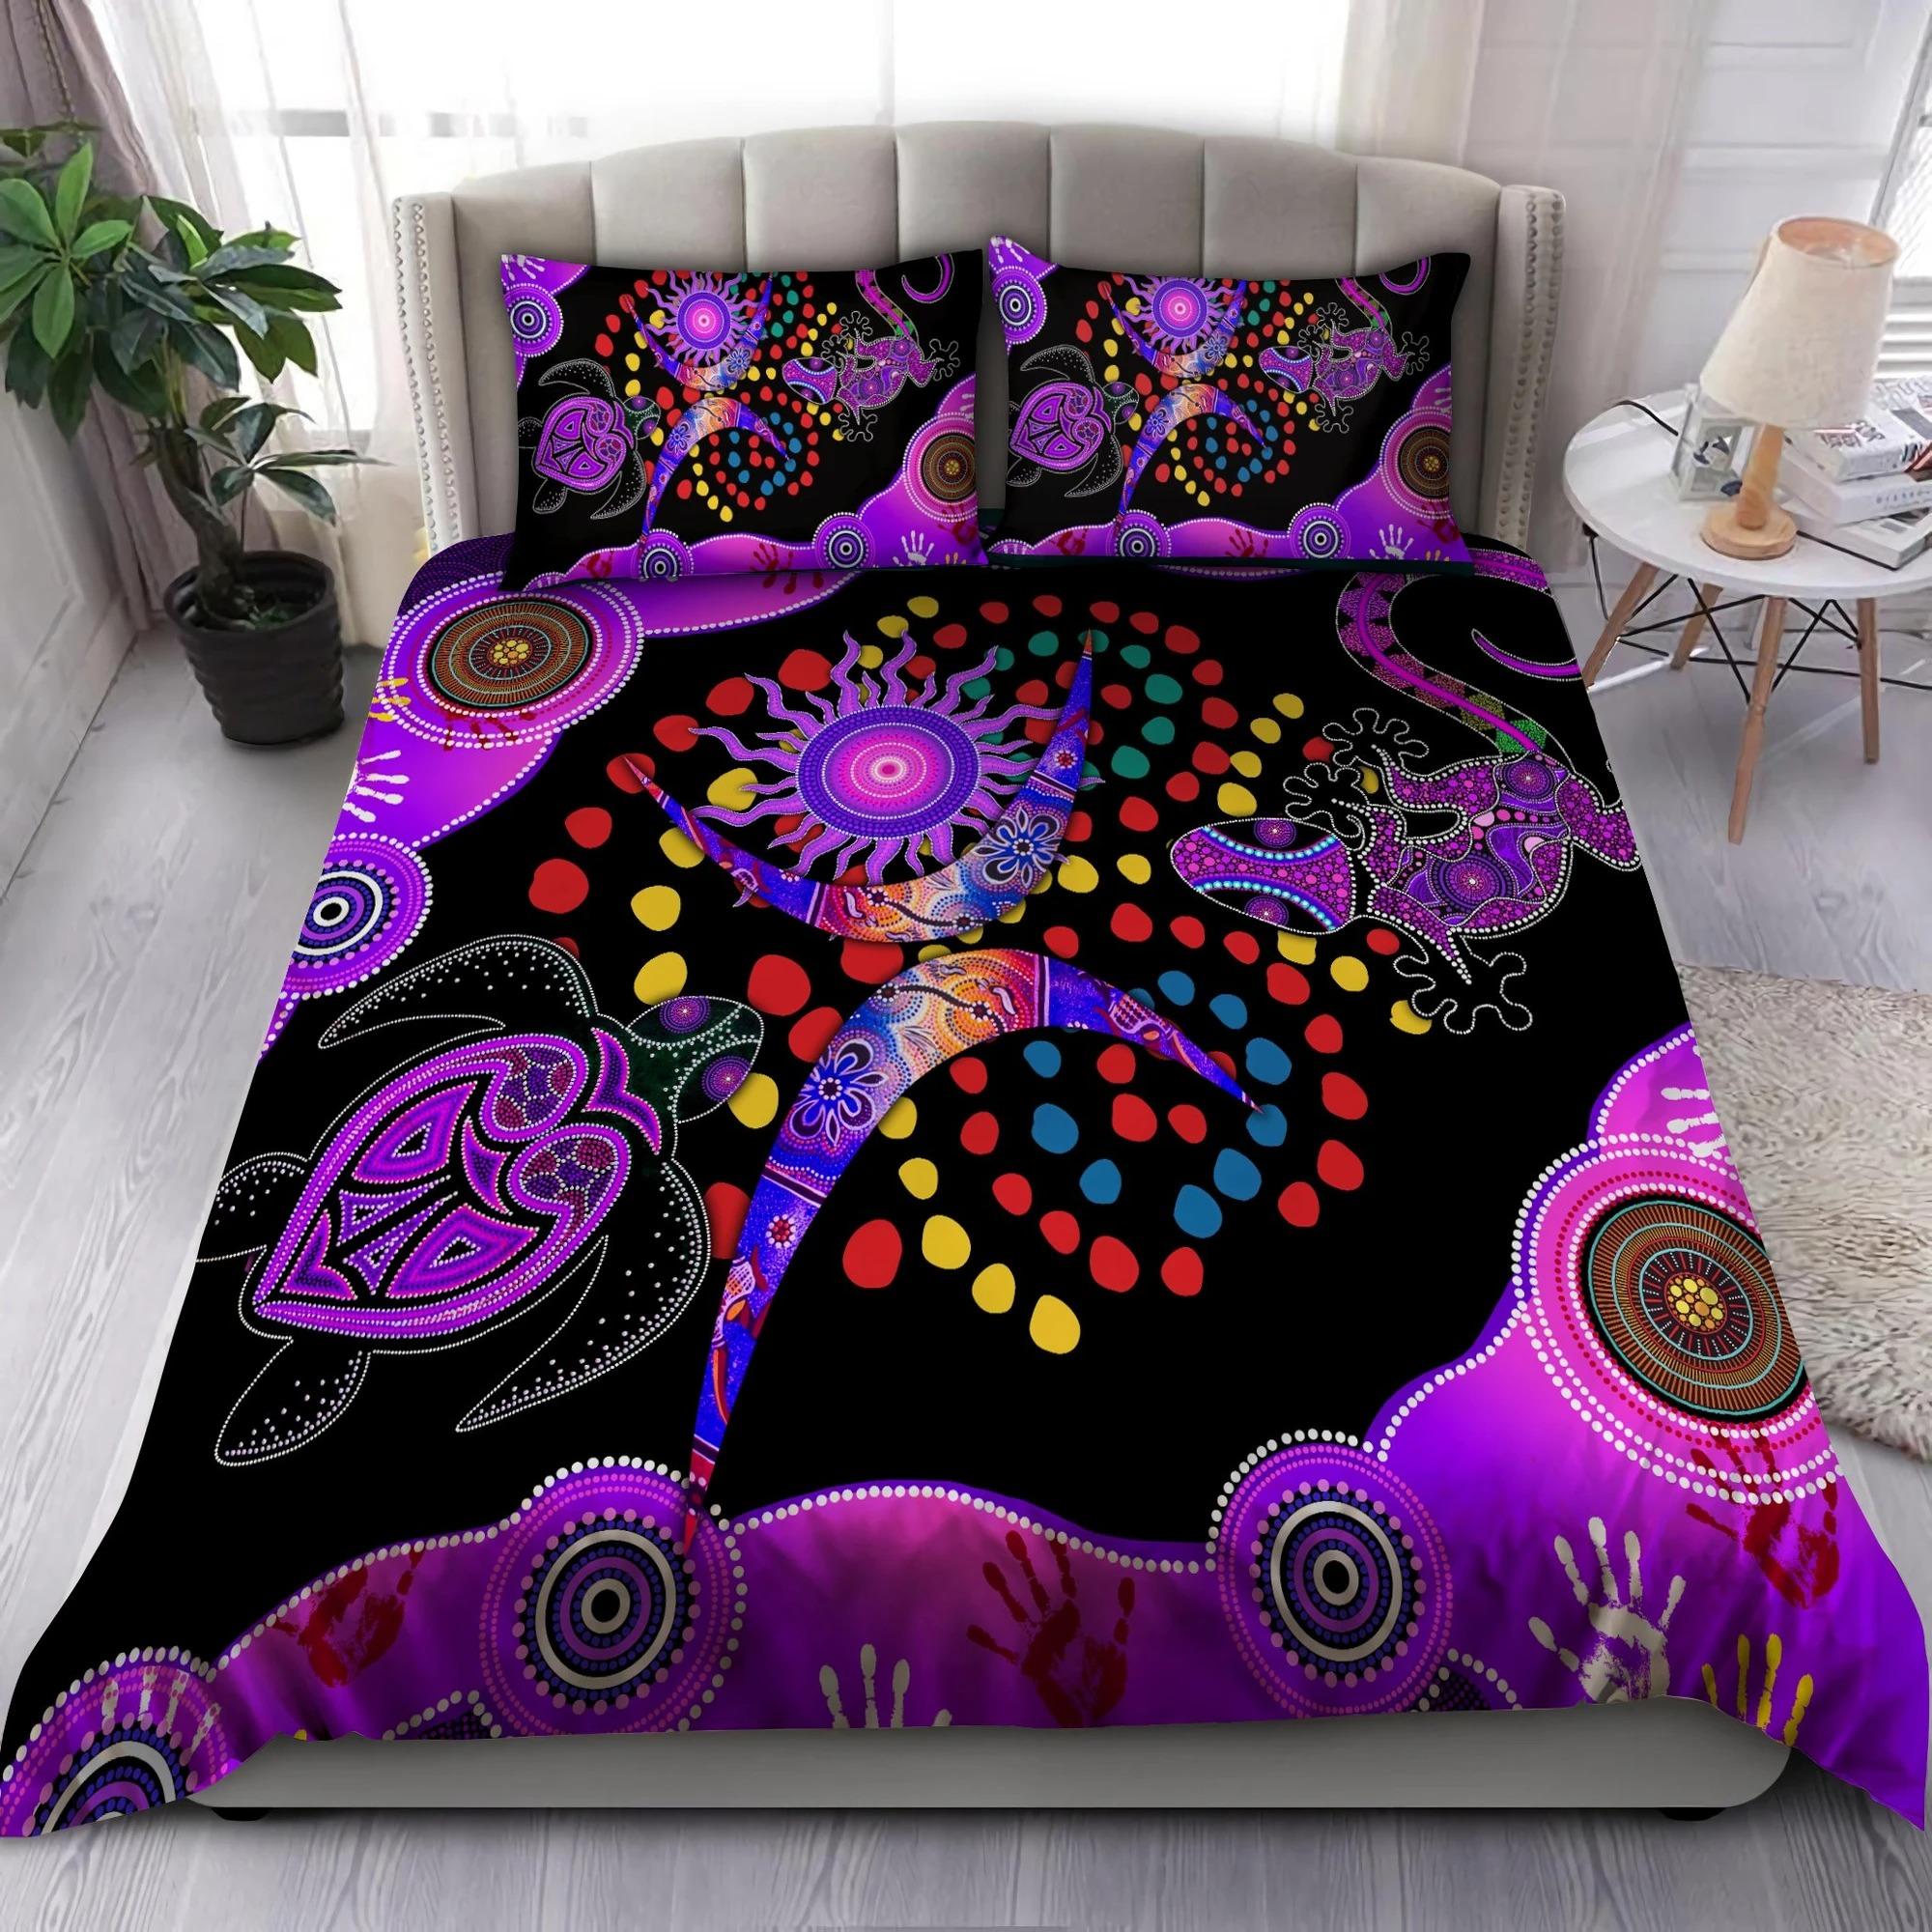 Aboriginal naidoc purple turtle lizard bedding set